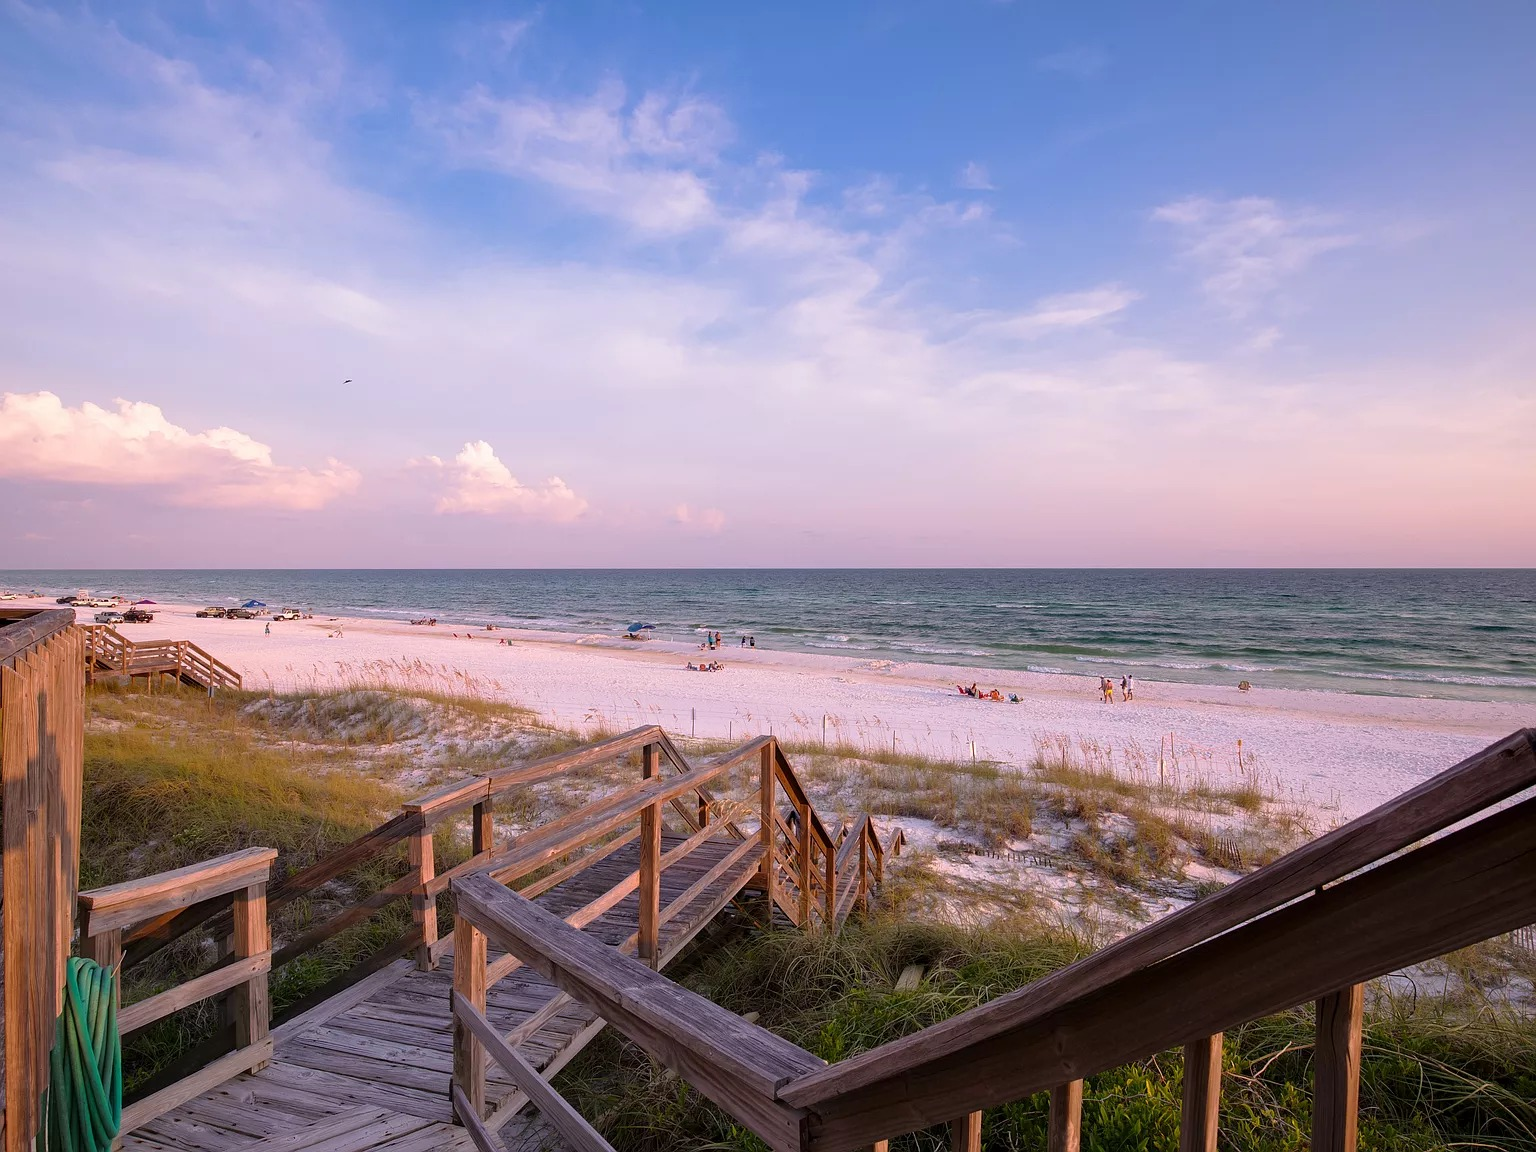 61 Auburn Dr, Santa Rosa Beach, FL 32459 - $4,195,000 home for sale, house images, photos and pics gallery